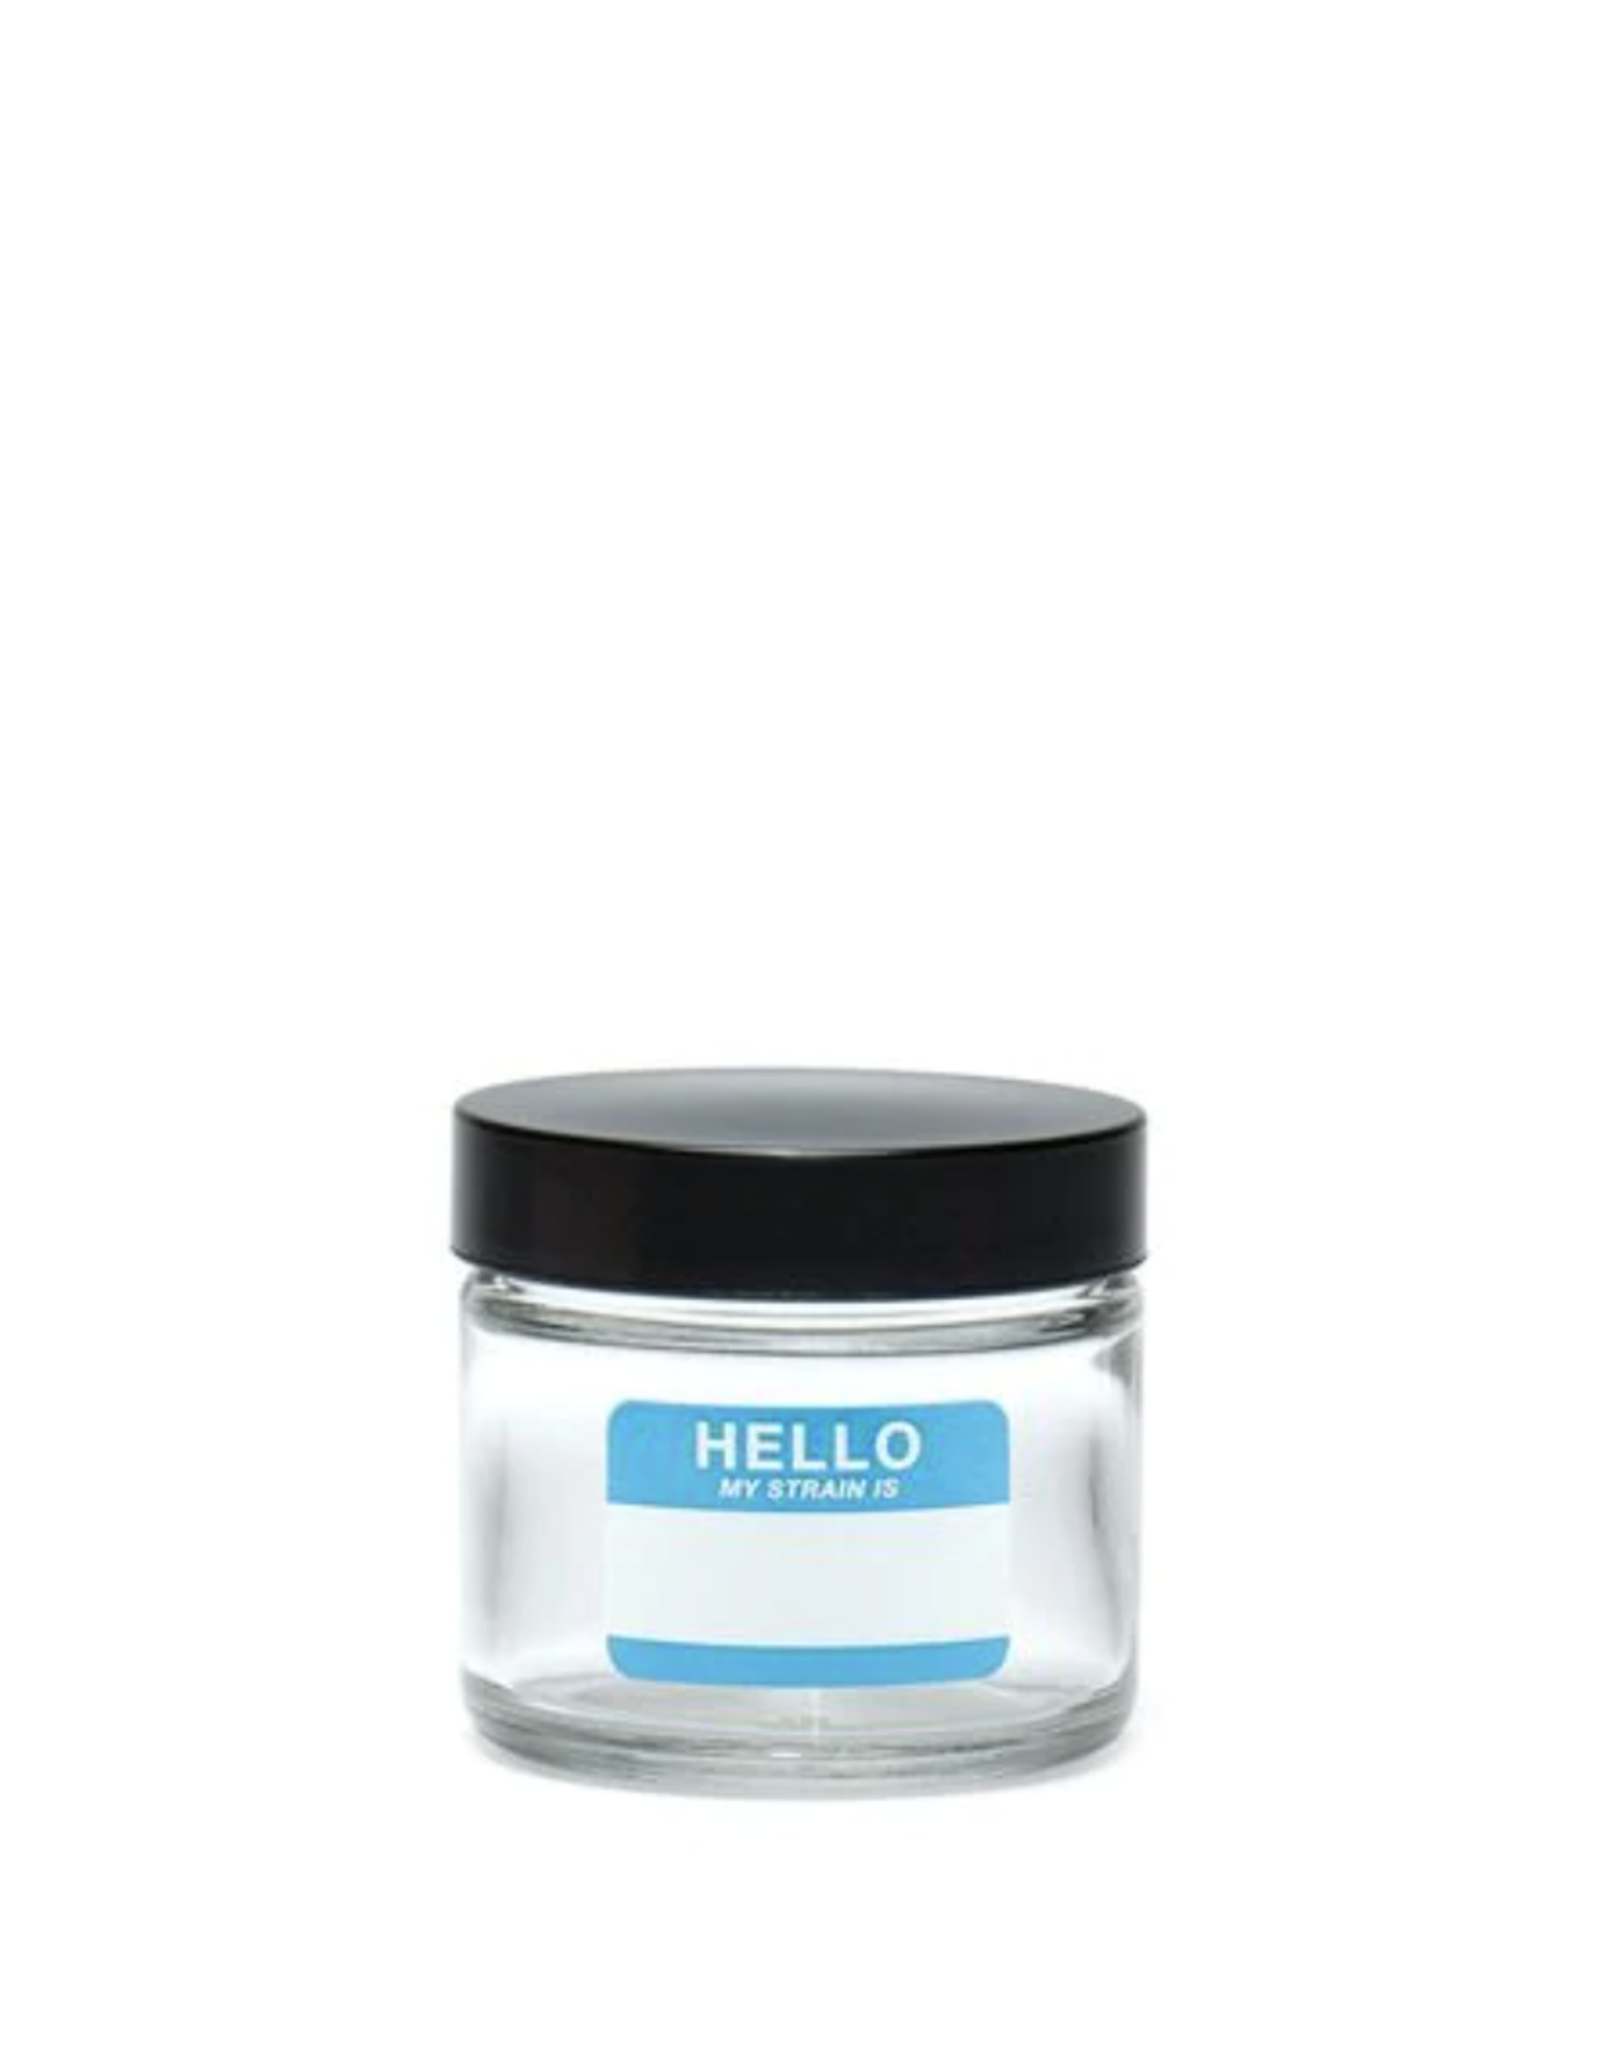 420 Science Screw Top Jar Small - Hello Write & Erase